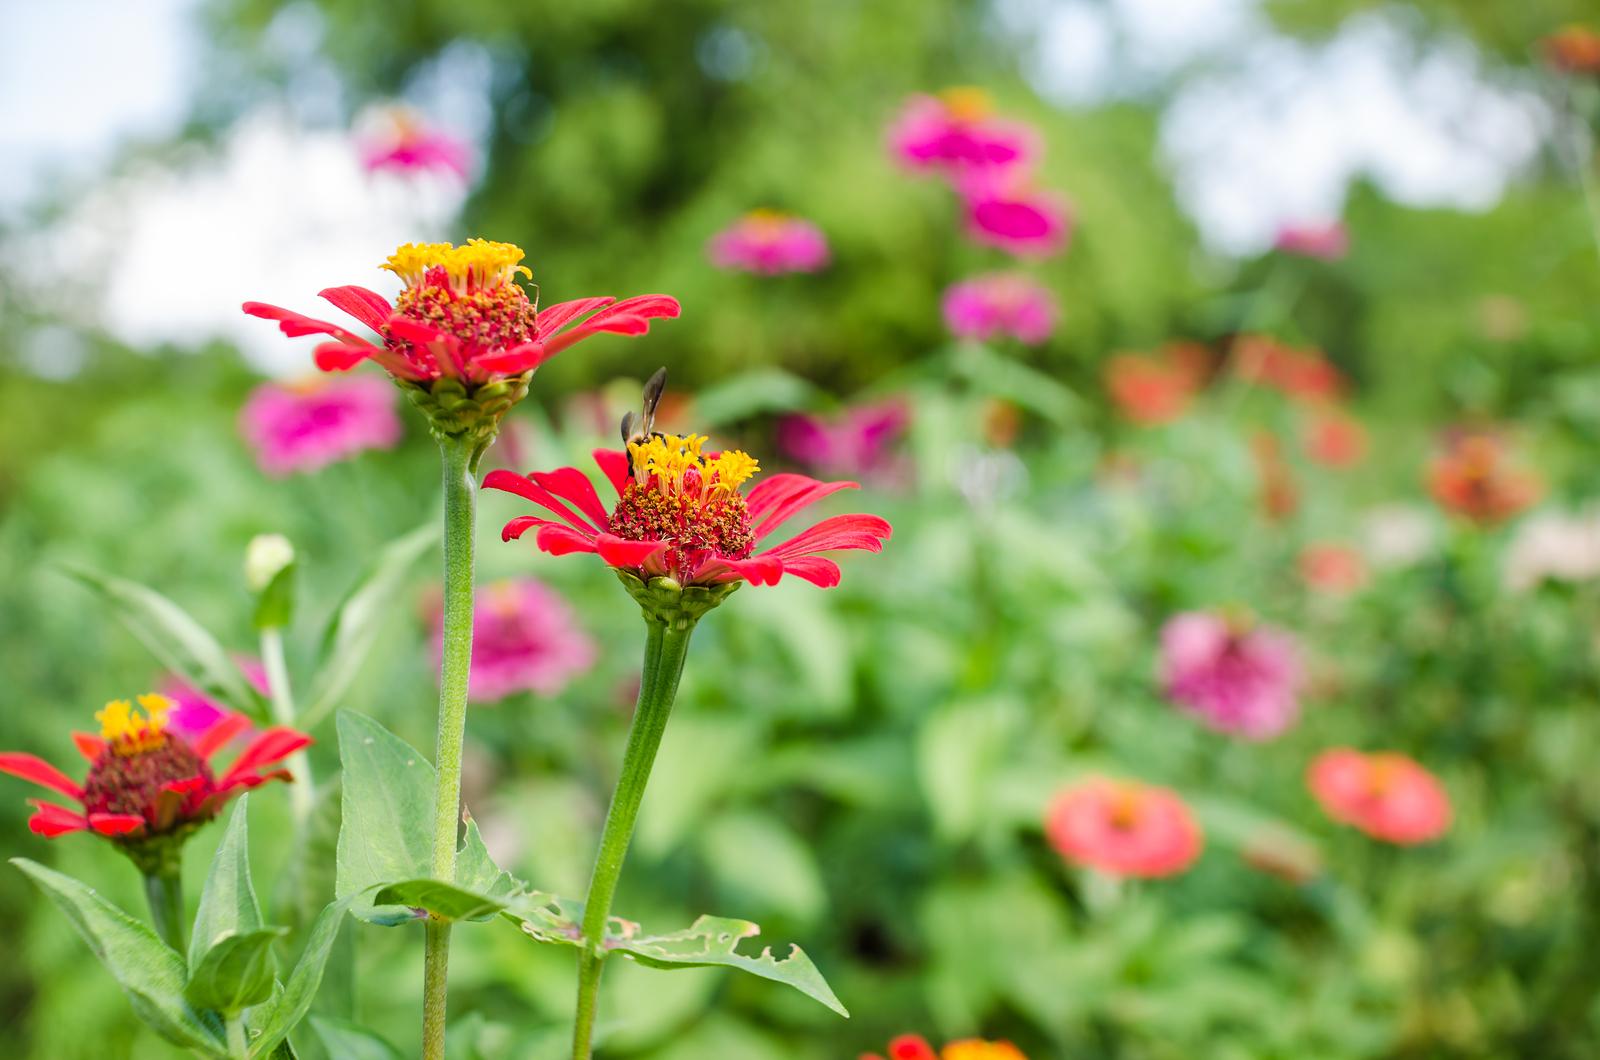 bigstock-Zinnia-Flower-66817108.jpg